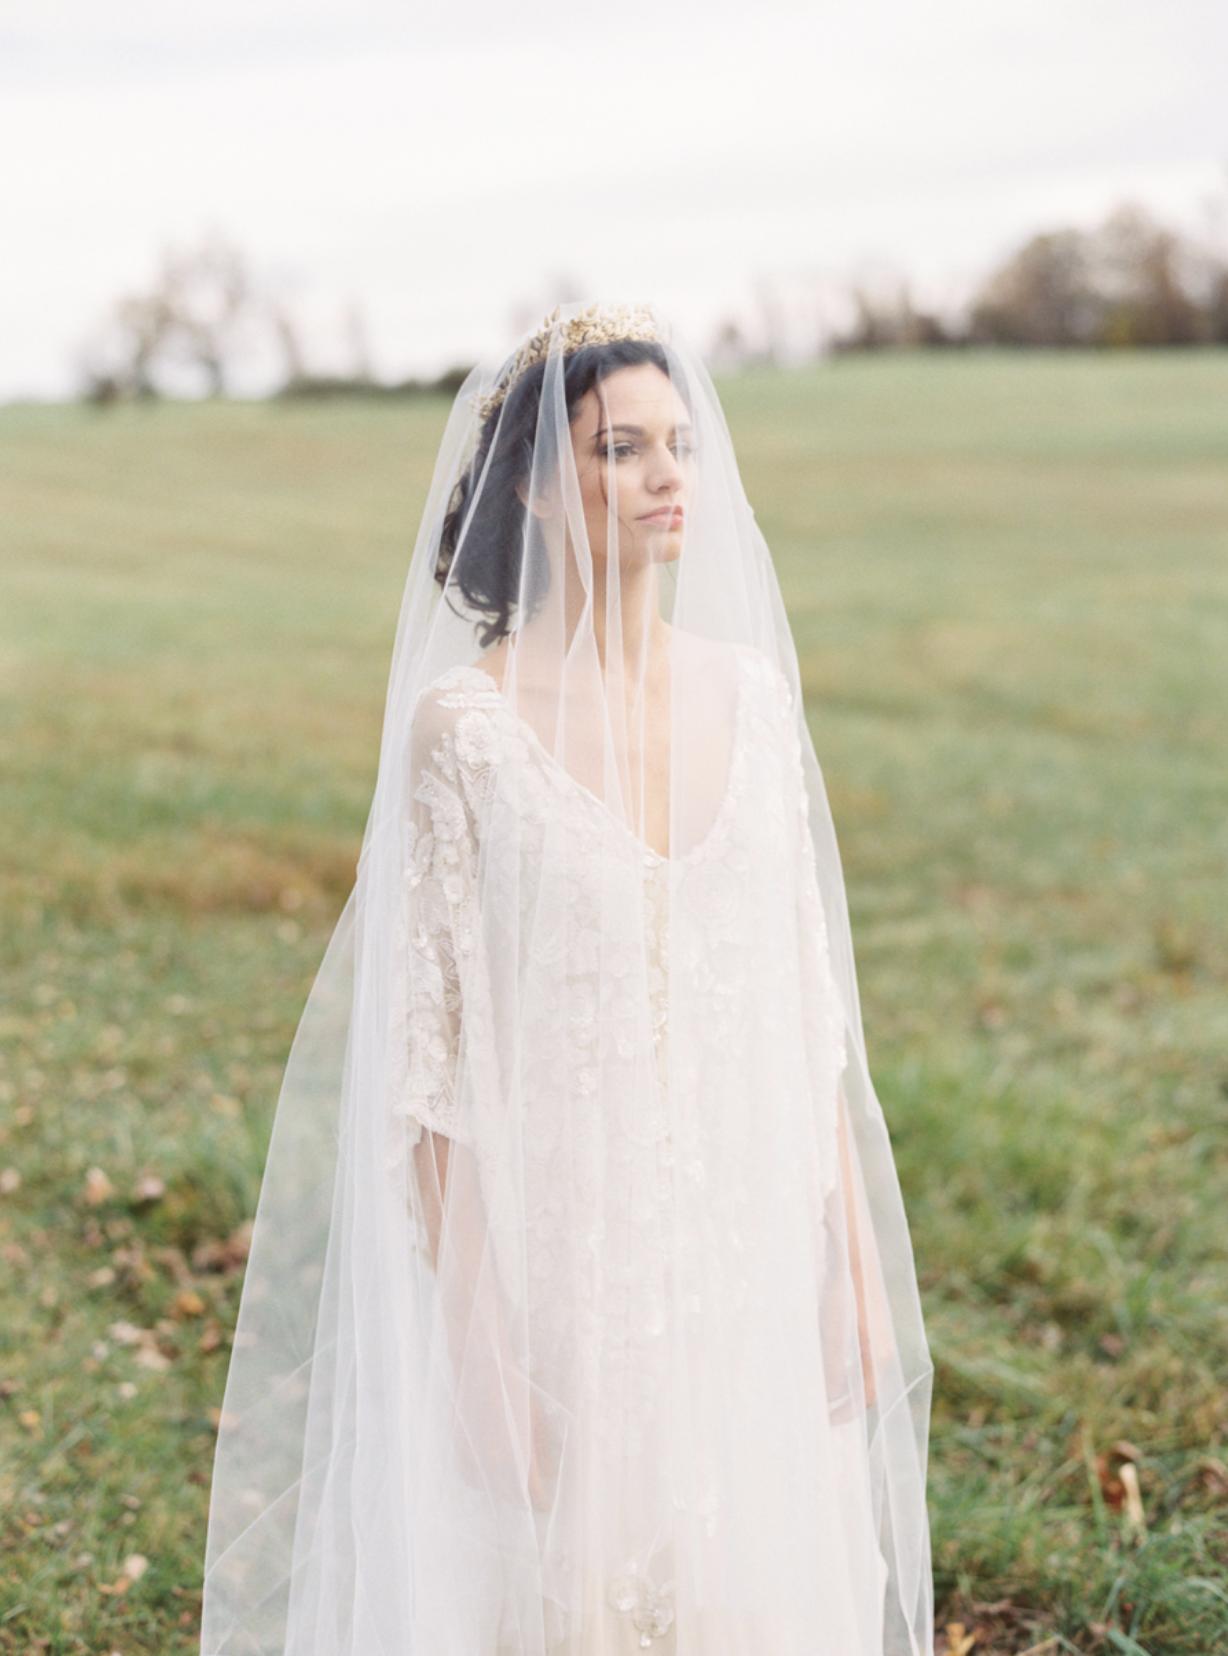 Carol Hannah Bridal Iolite Gown Shanon Moffit Photography 24.png